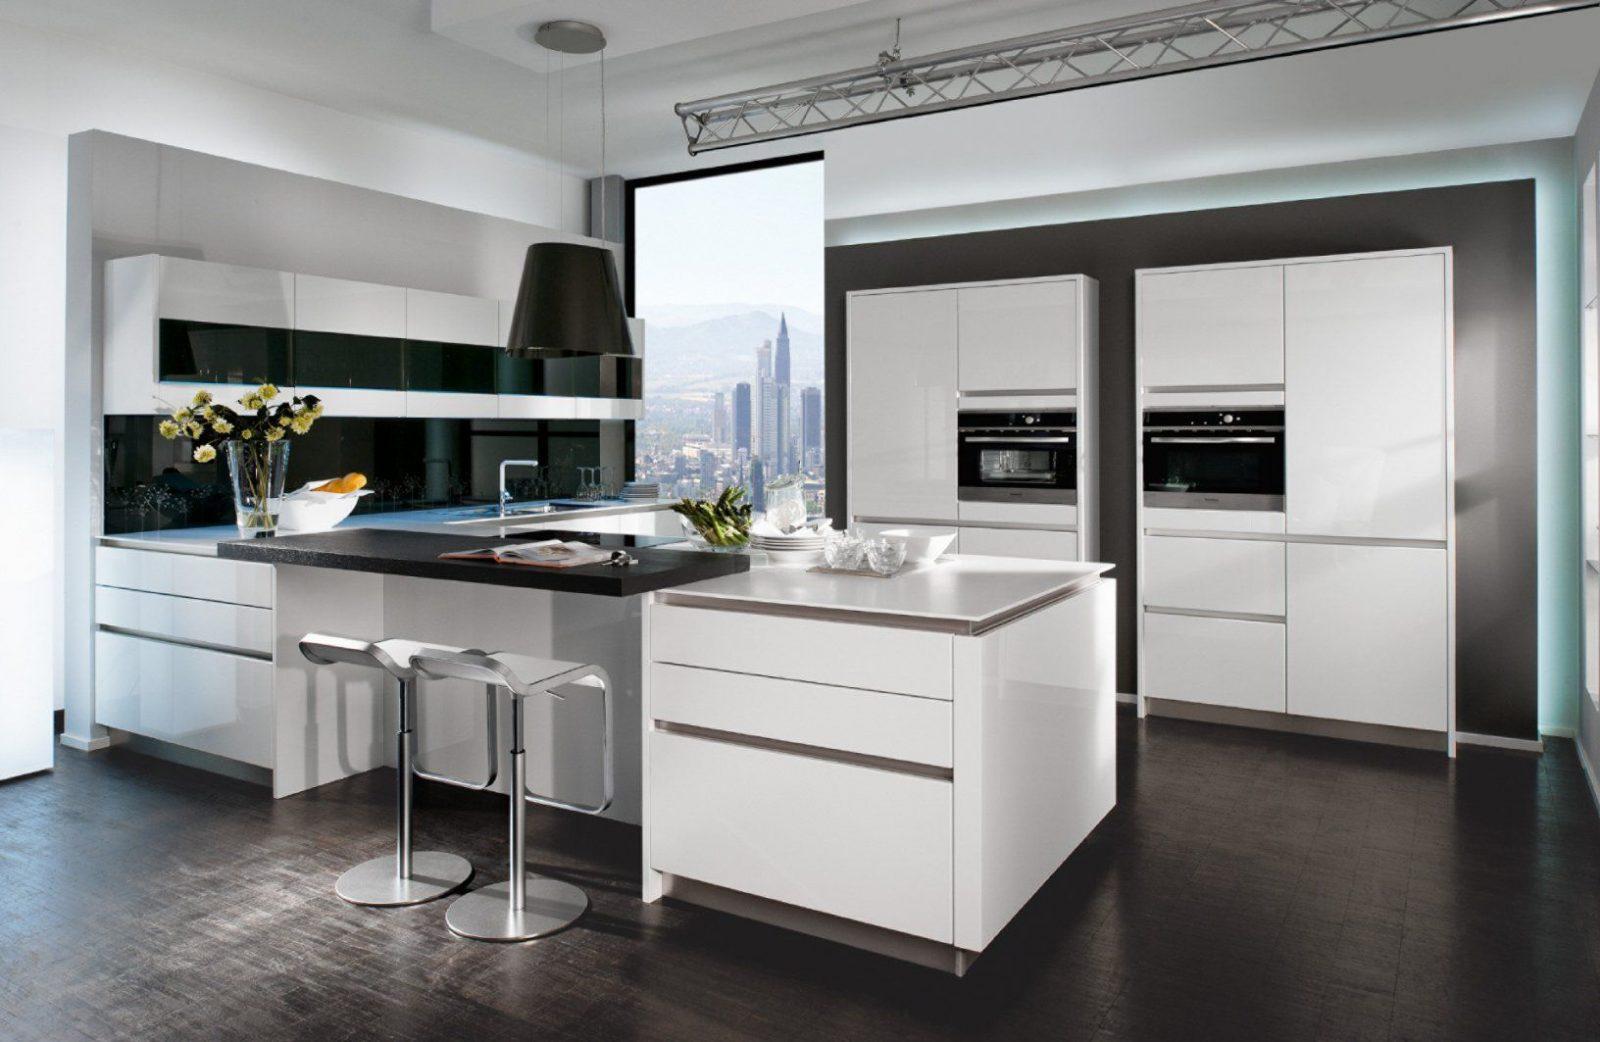 moderne kuche mit kochinsel, ikea küche mit kochinsel | haus design ideen, Design ideen